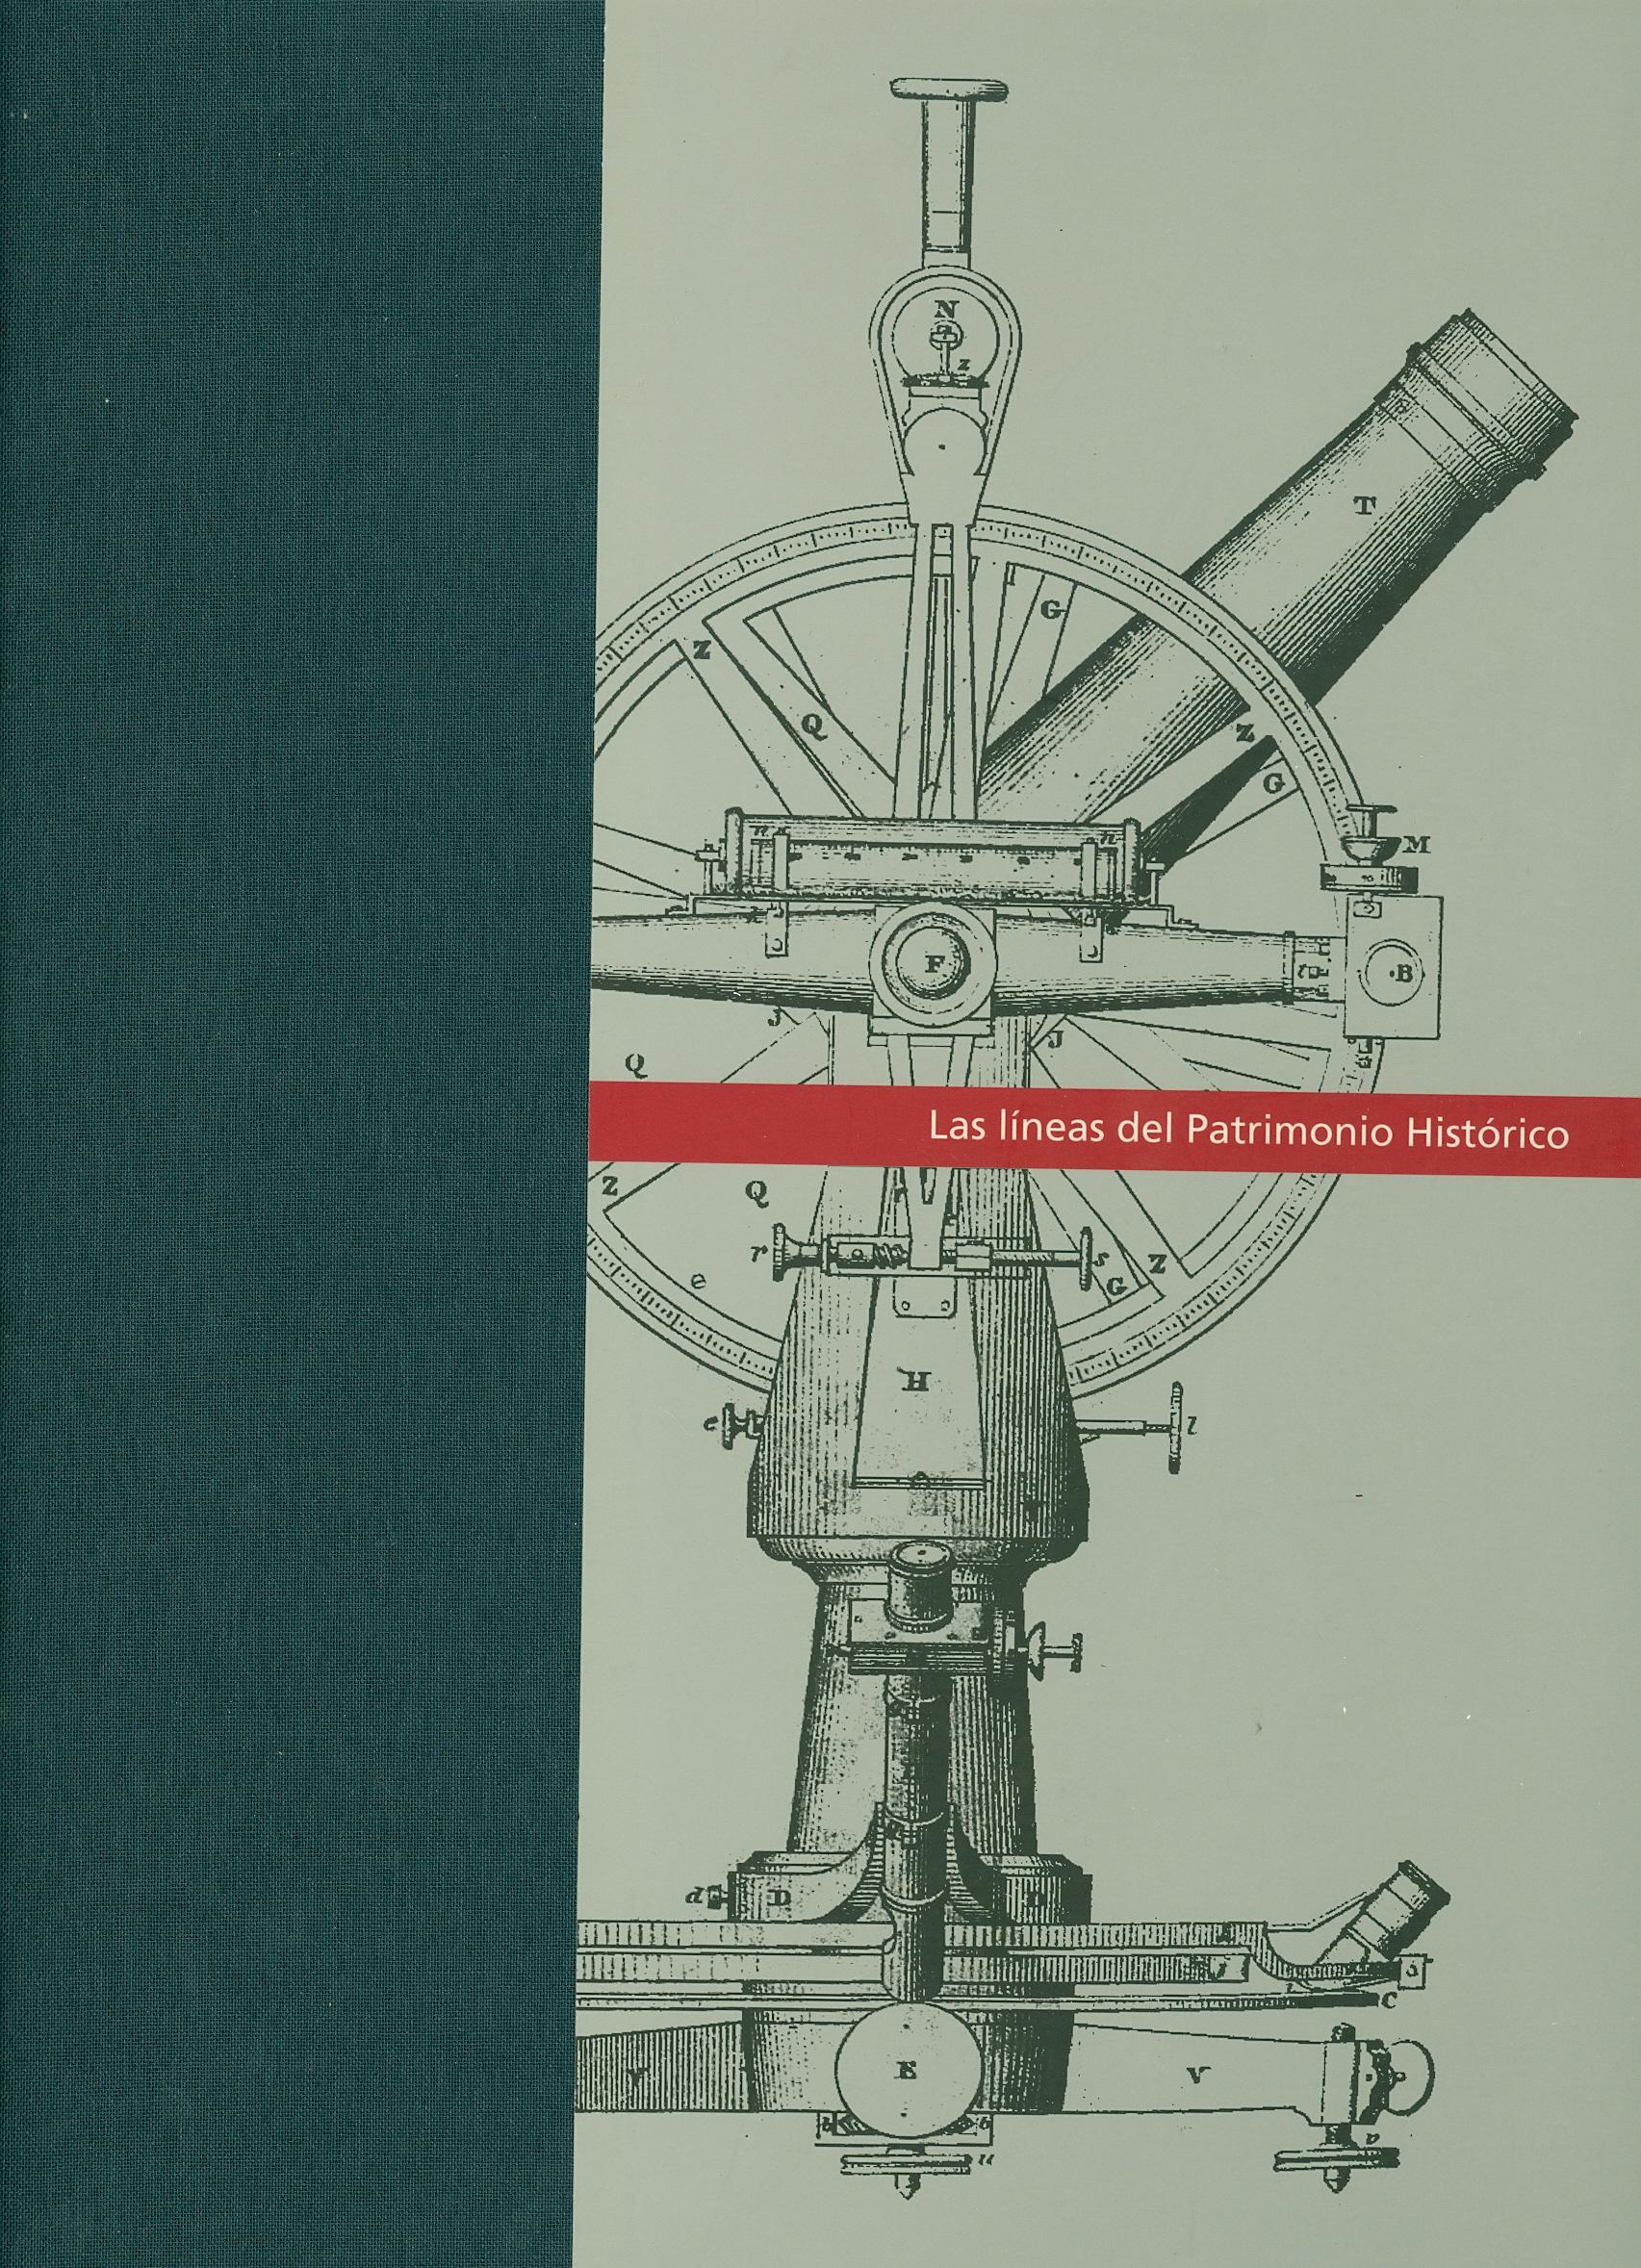 Las Líneas de patrimonio histórico. Planos del siglo XIX de la provincia de Toledo I, II, III